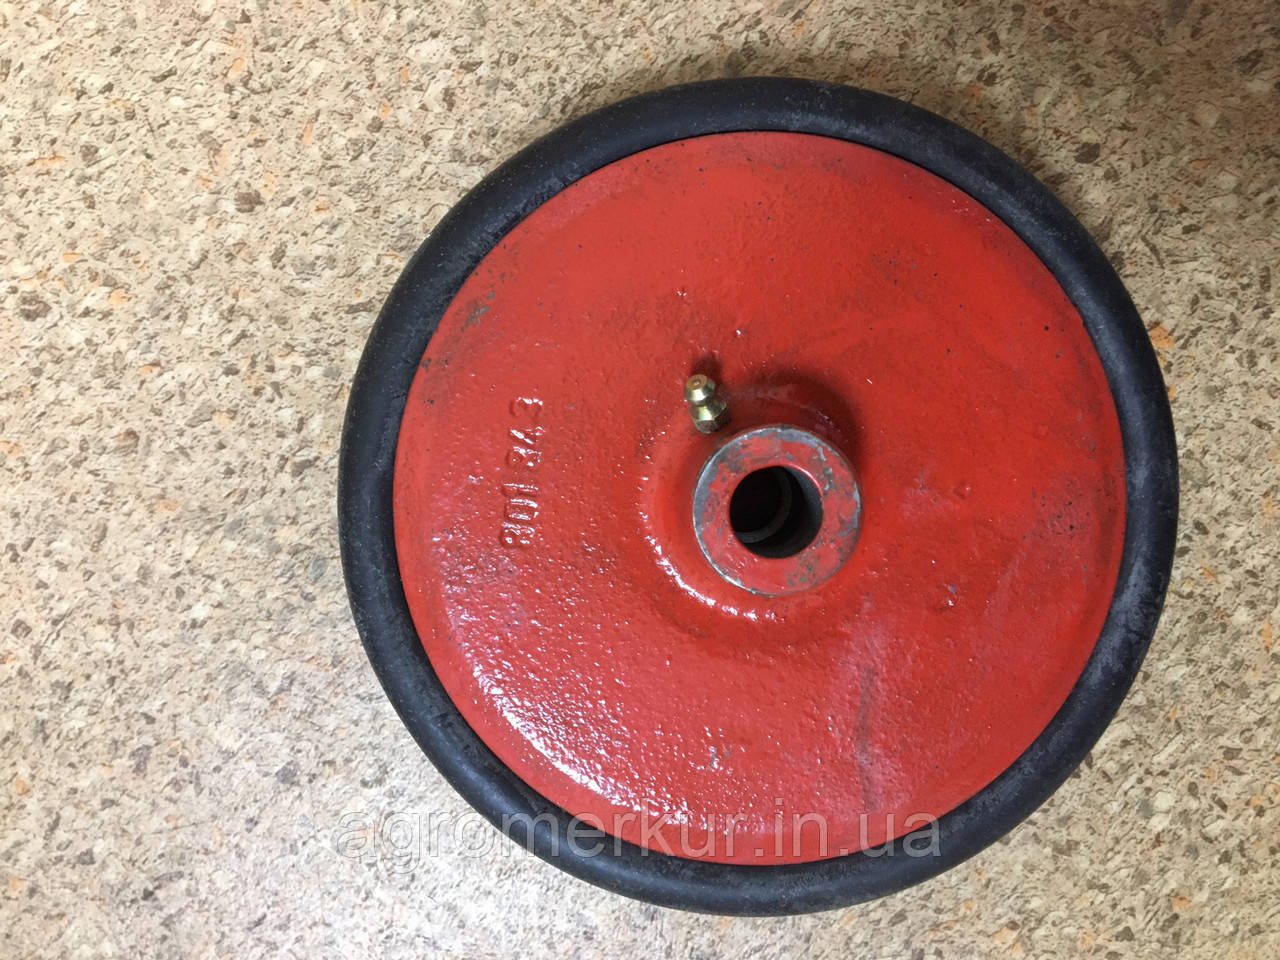 Колесо прикотуюче AC801843 Kverneland (AC858095)